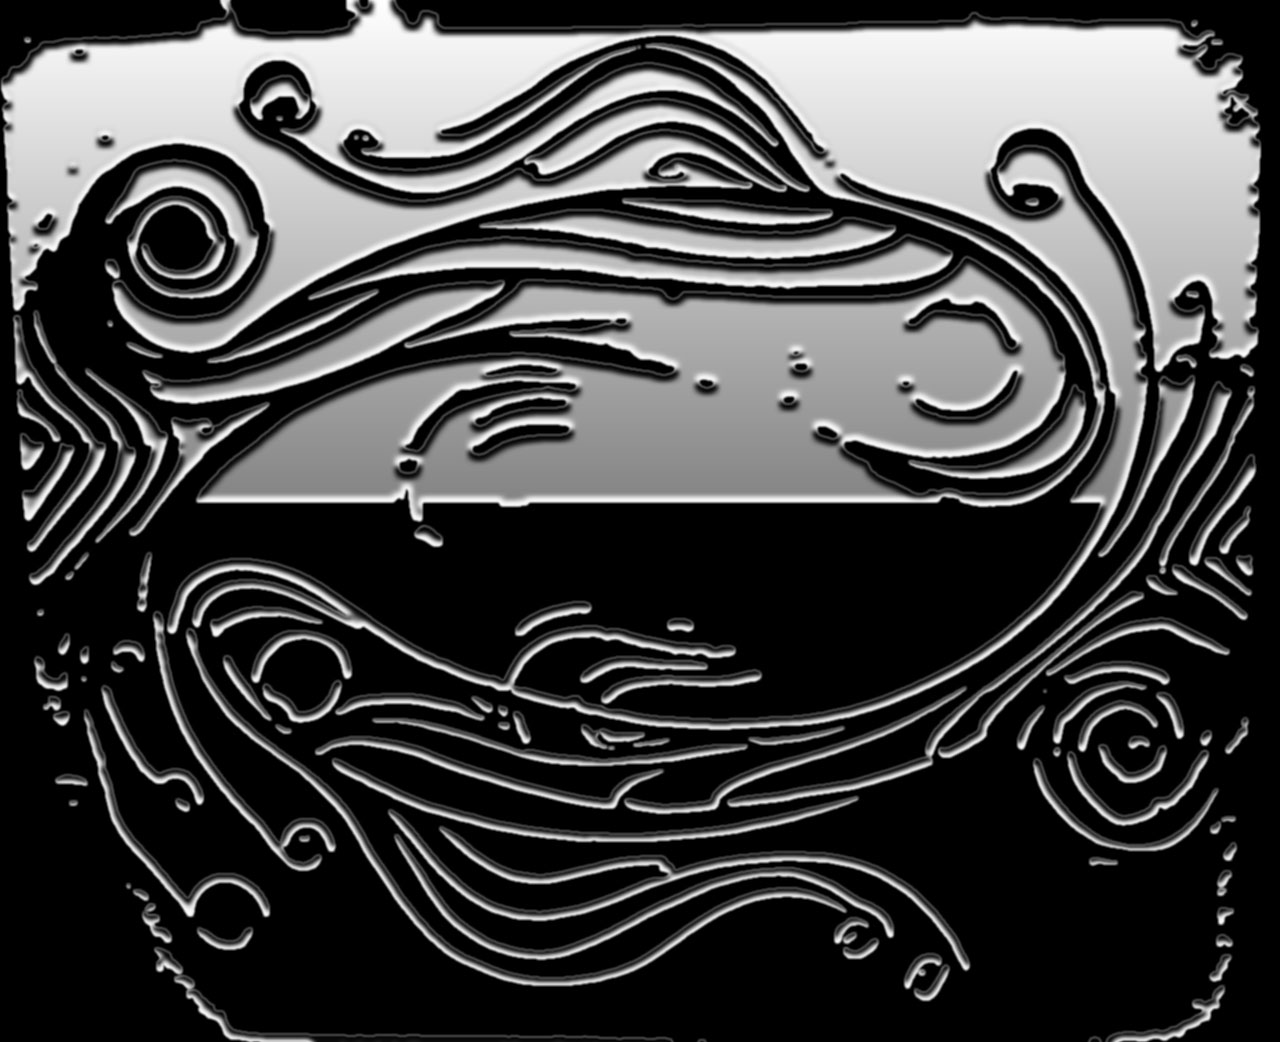 Kalomo Digital Yin Yang.JPG